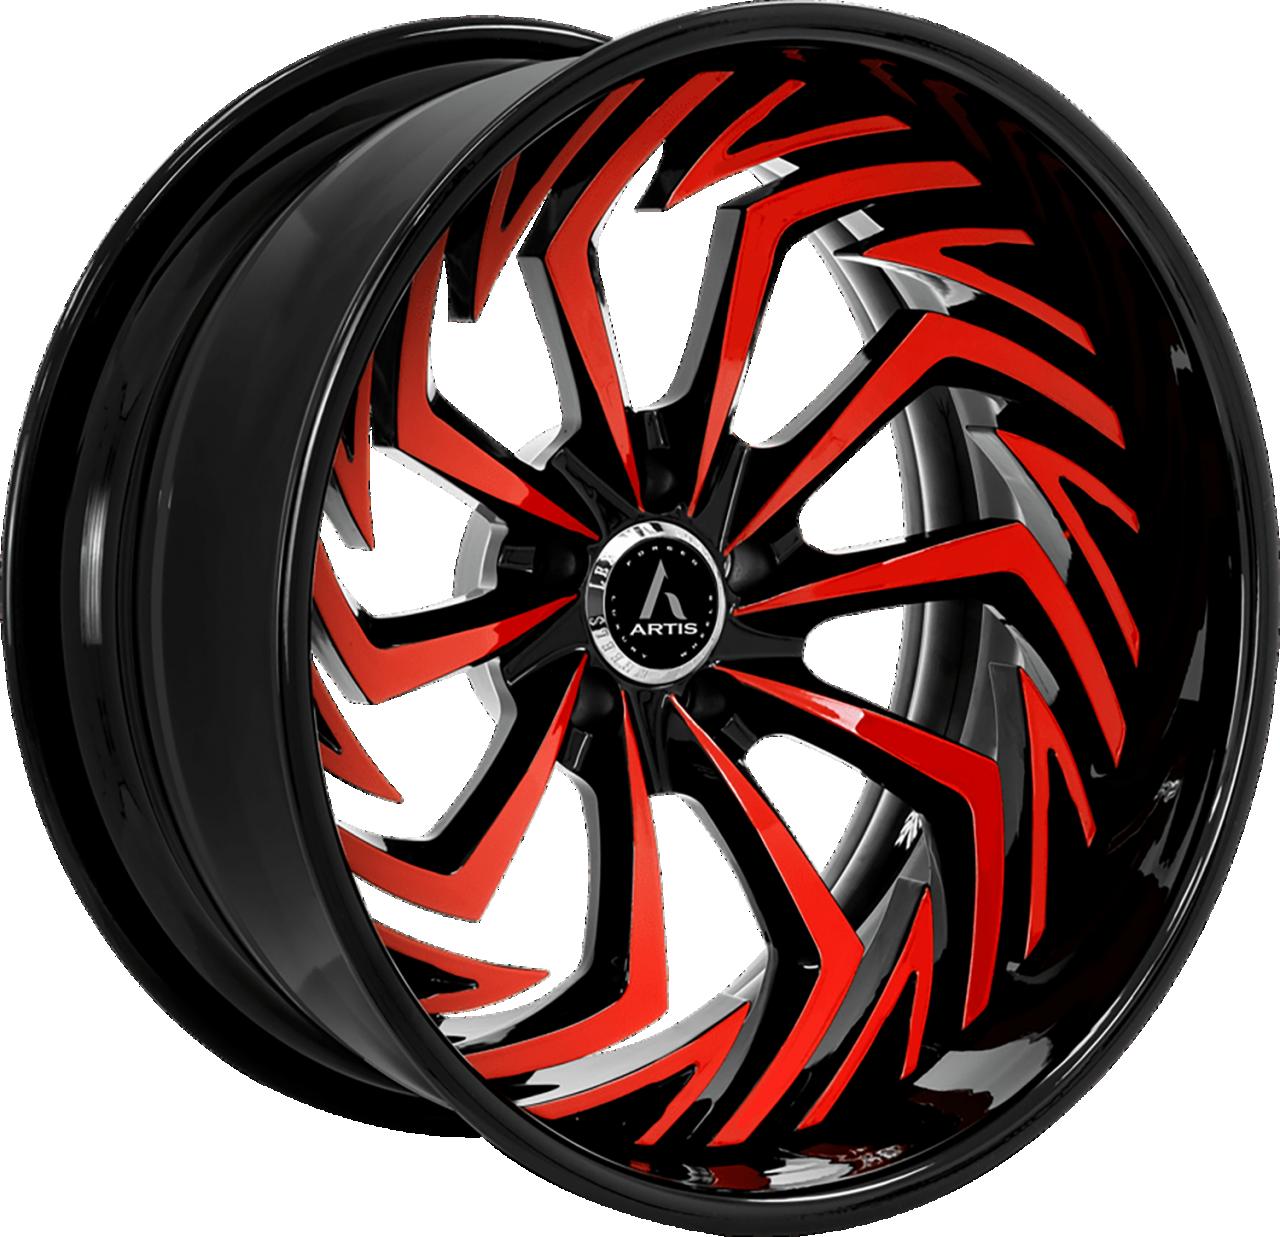 Artis Forged Royal wheel with Custom finish